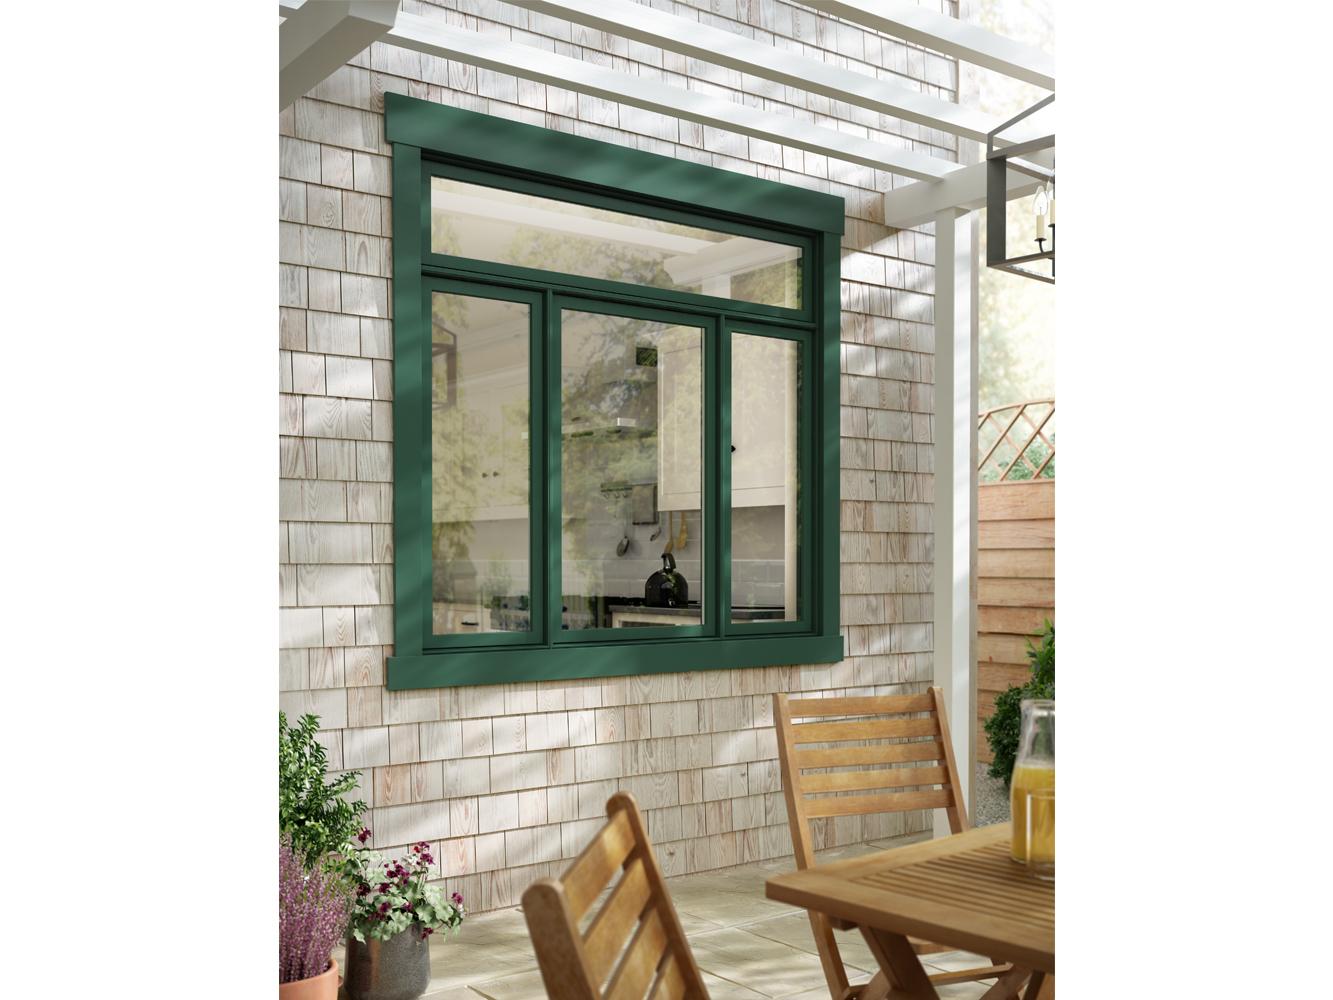 pix-us-cg-green-window